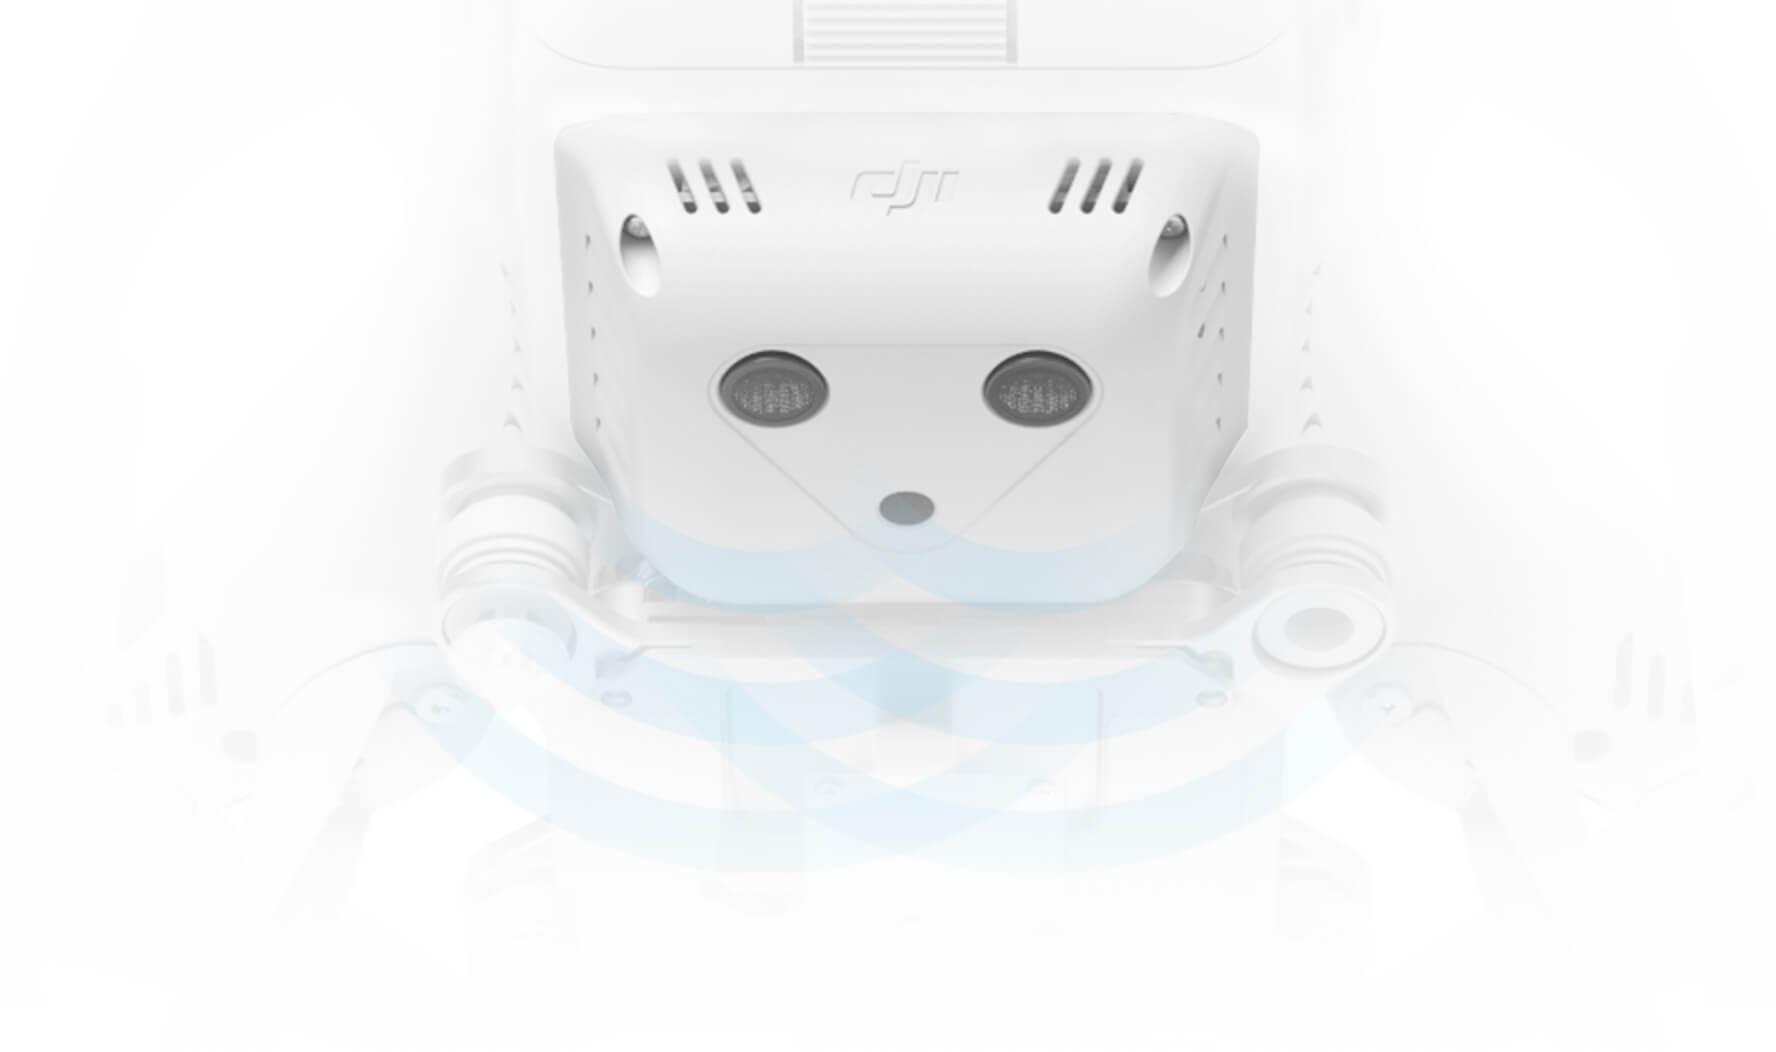 s5 img 3b35dad761b3e06e2cf15b3ba26914b3 - DJI Phantom 3 Professional